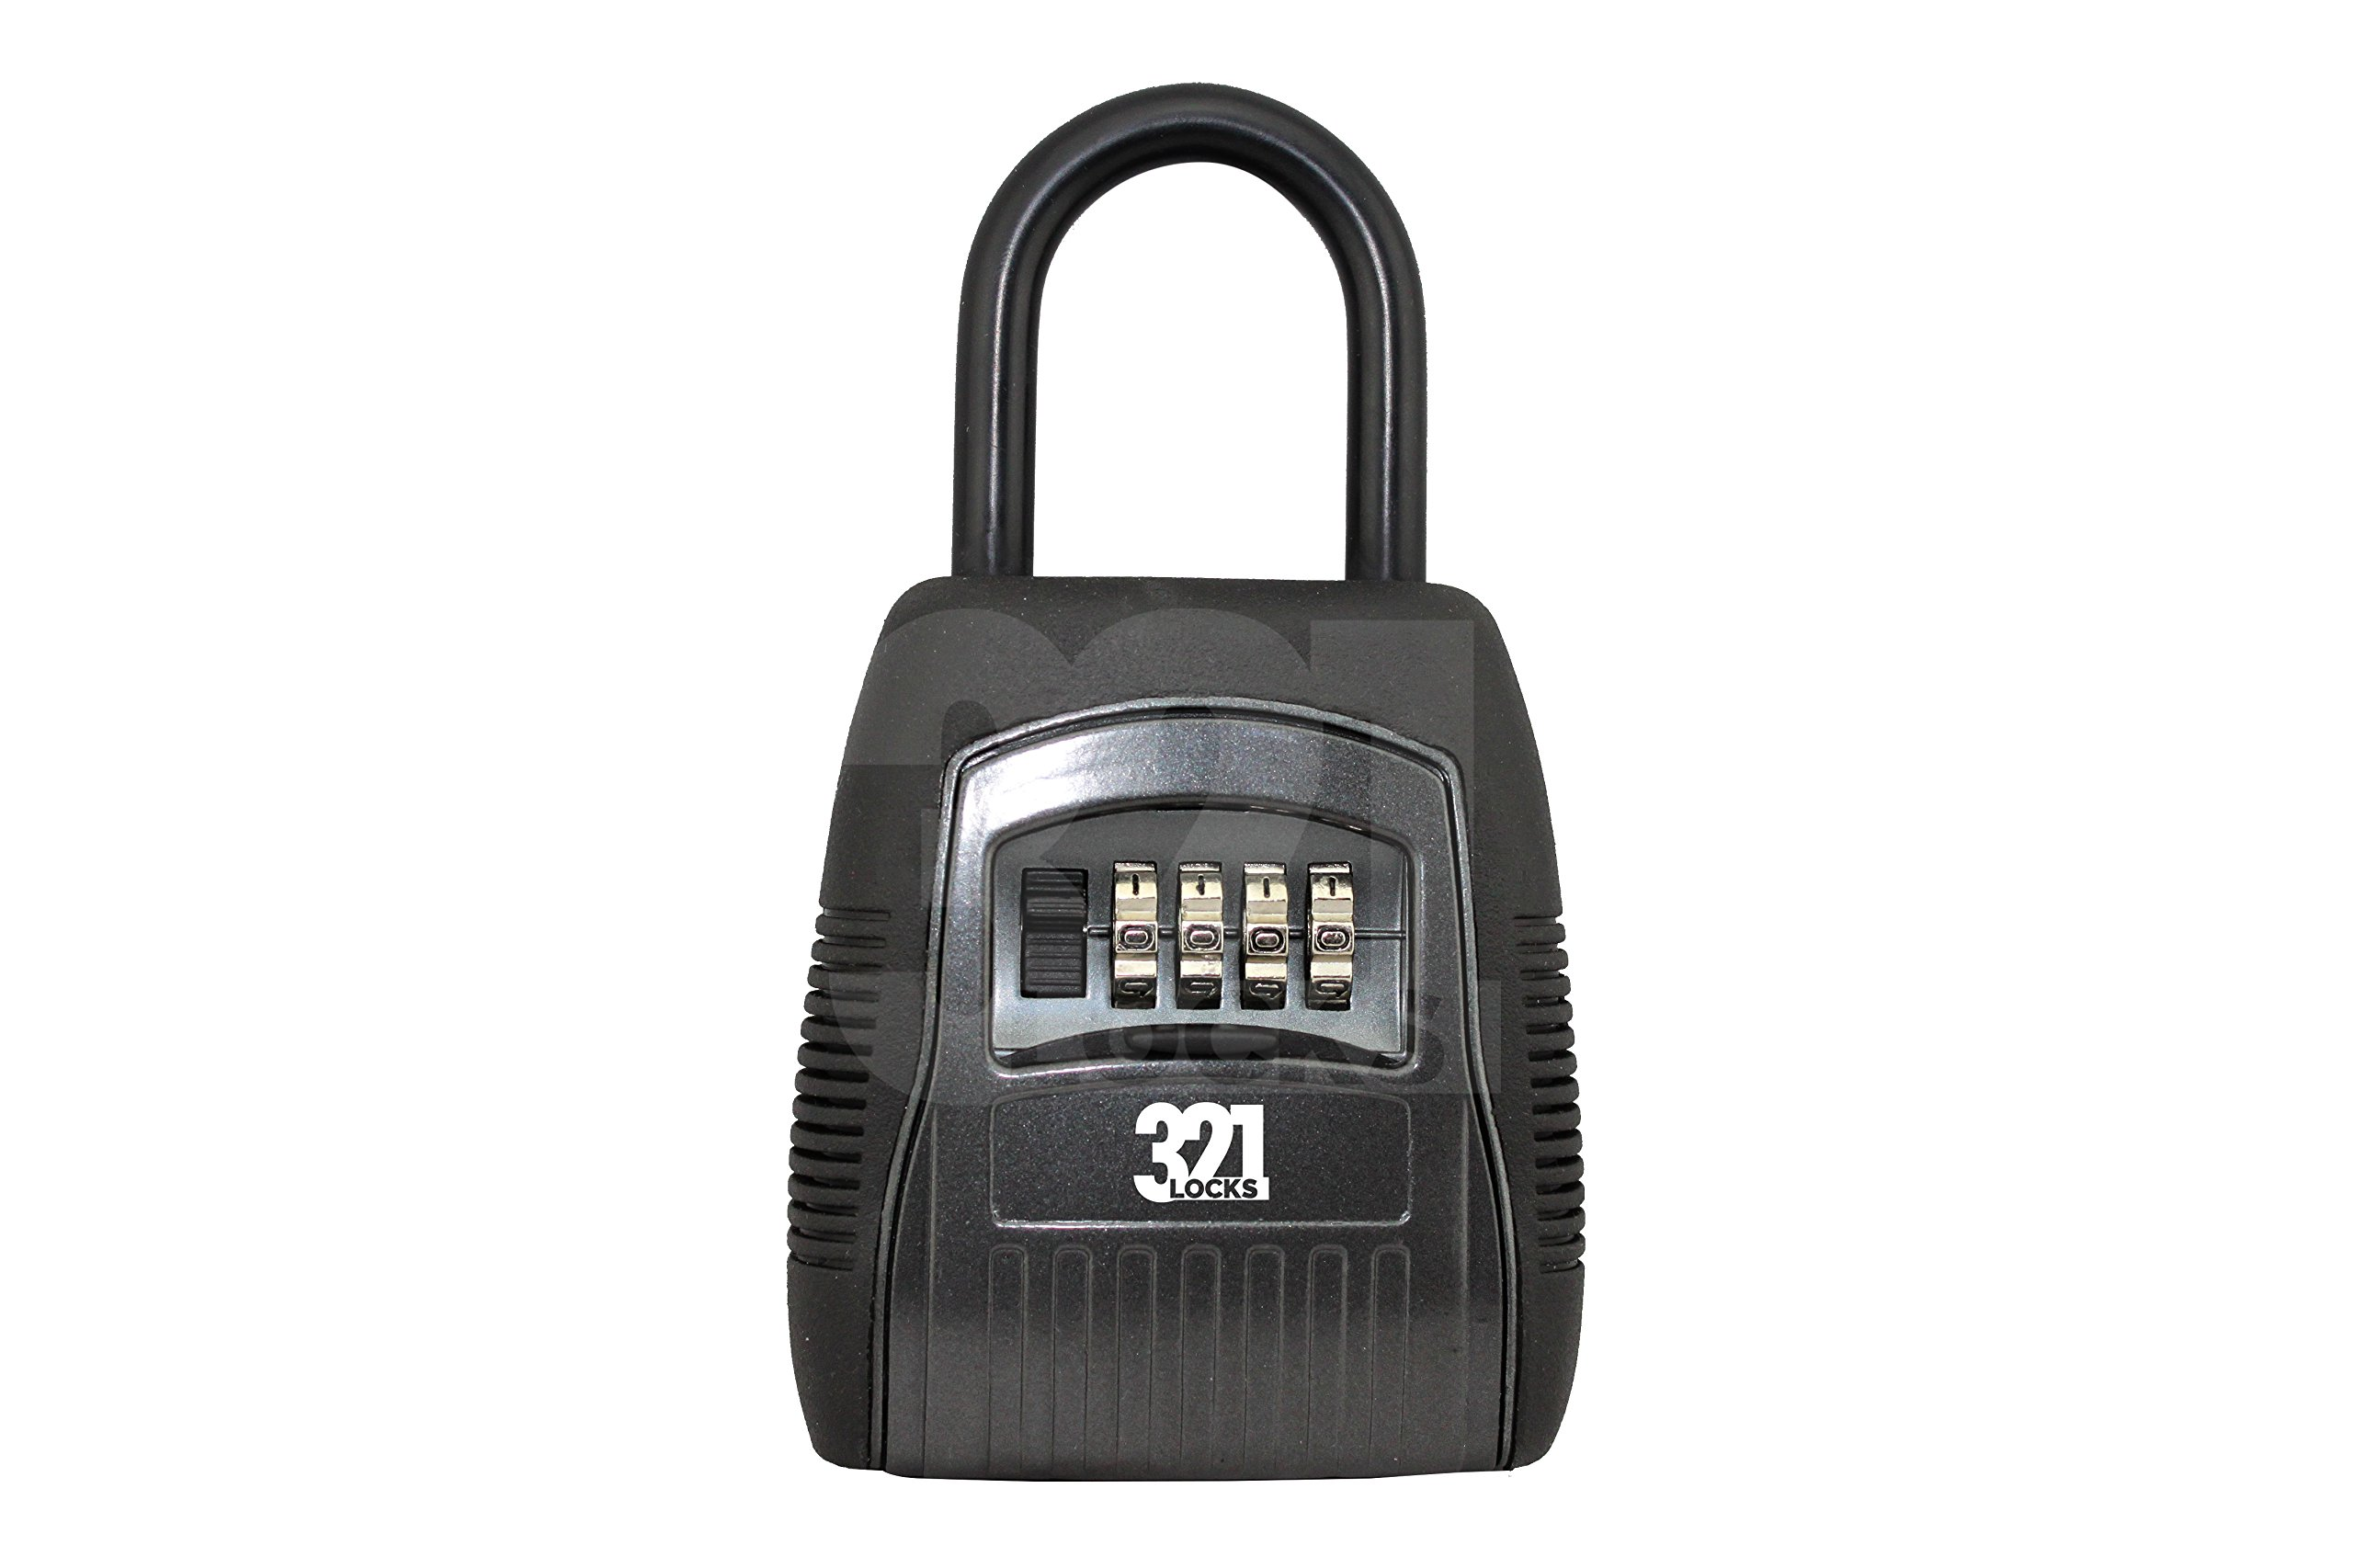 REALTOR KEY LOCK BOX Safe vault -Combination 4 Pin Lock - Knob Mounted for Maximum Security - Master Heavy Duty Slimline Keys Storage System